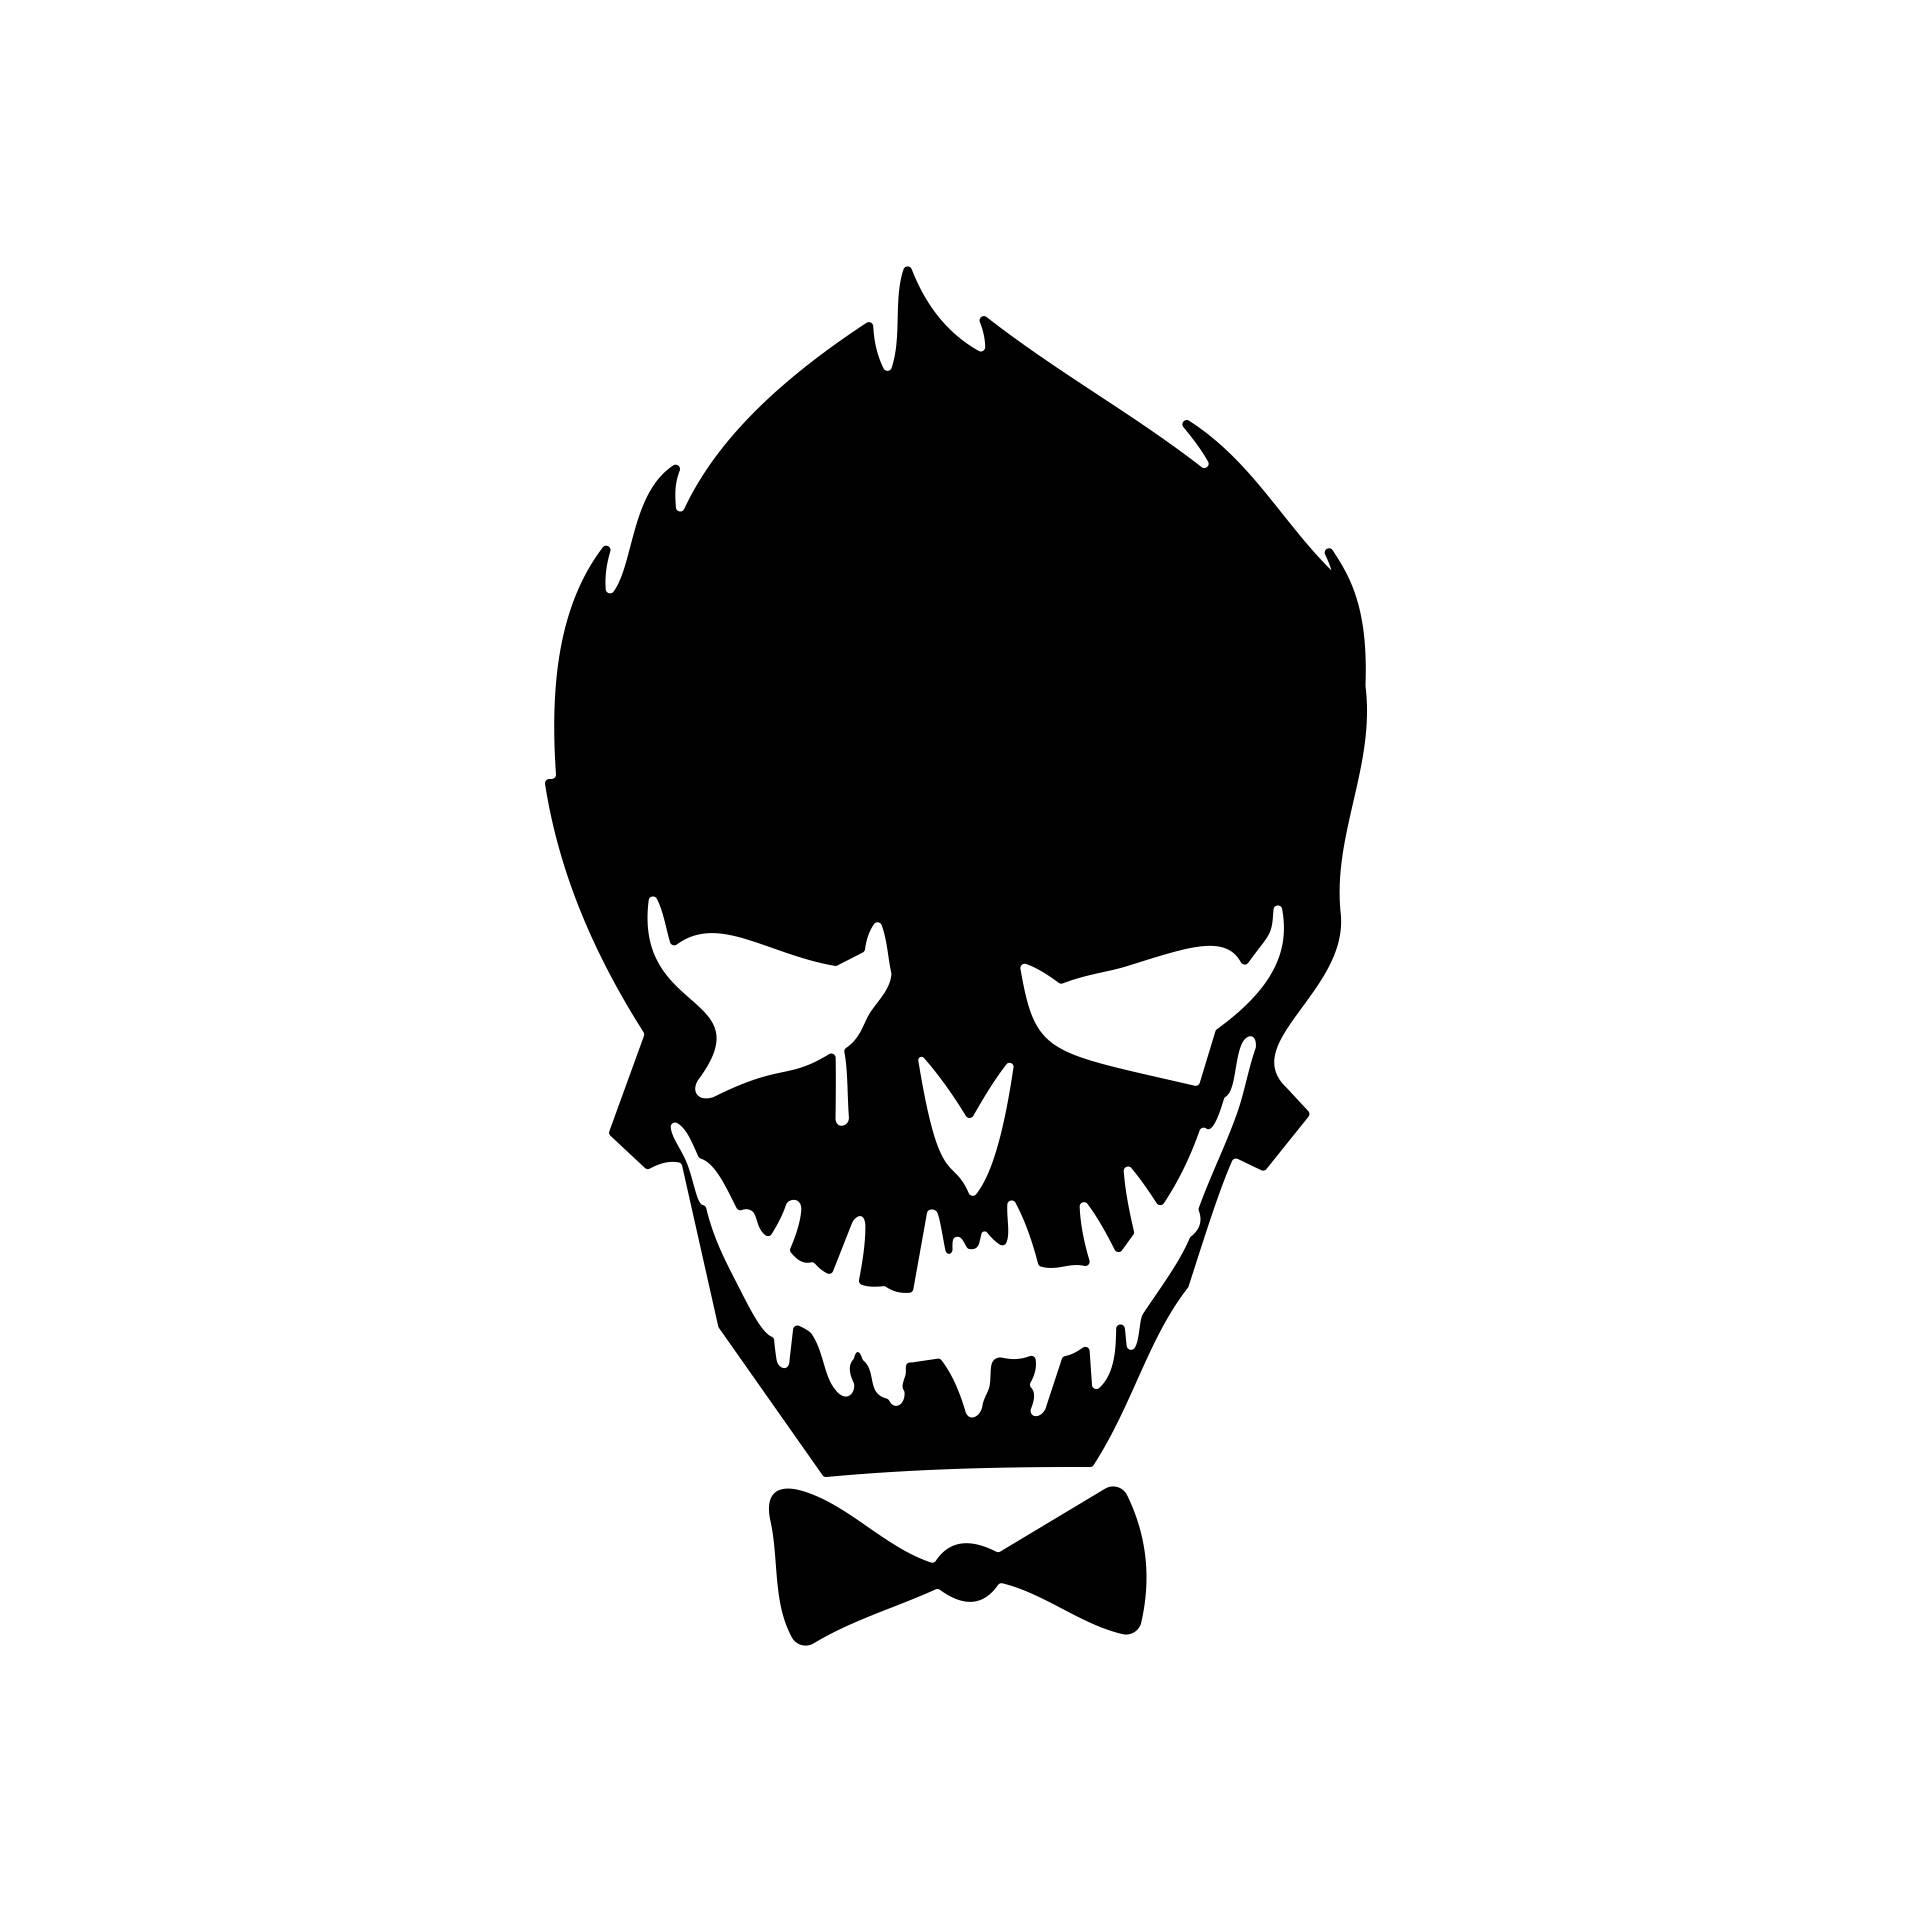 Suicide Squad Joker Silhouette.